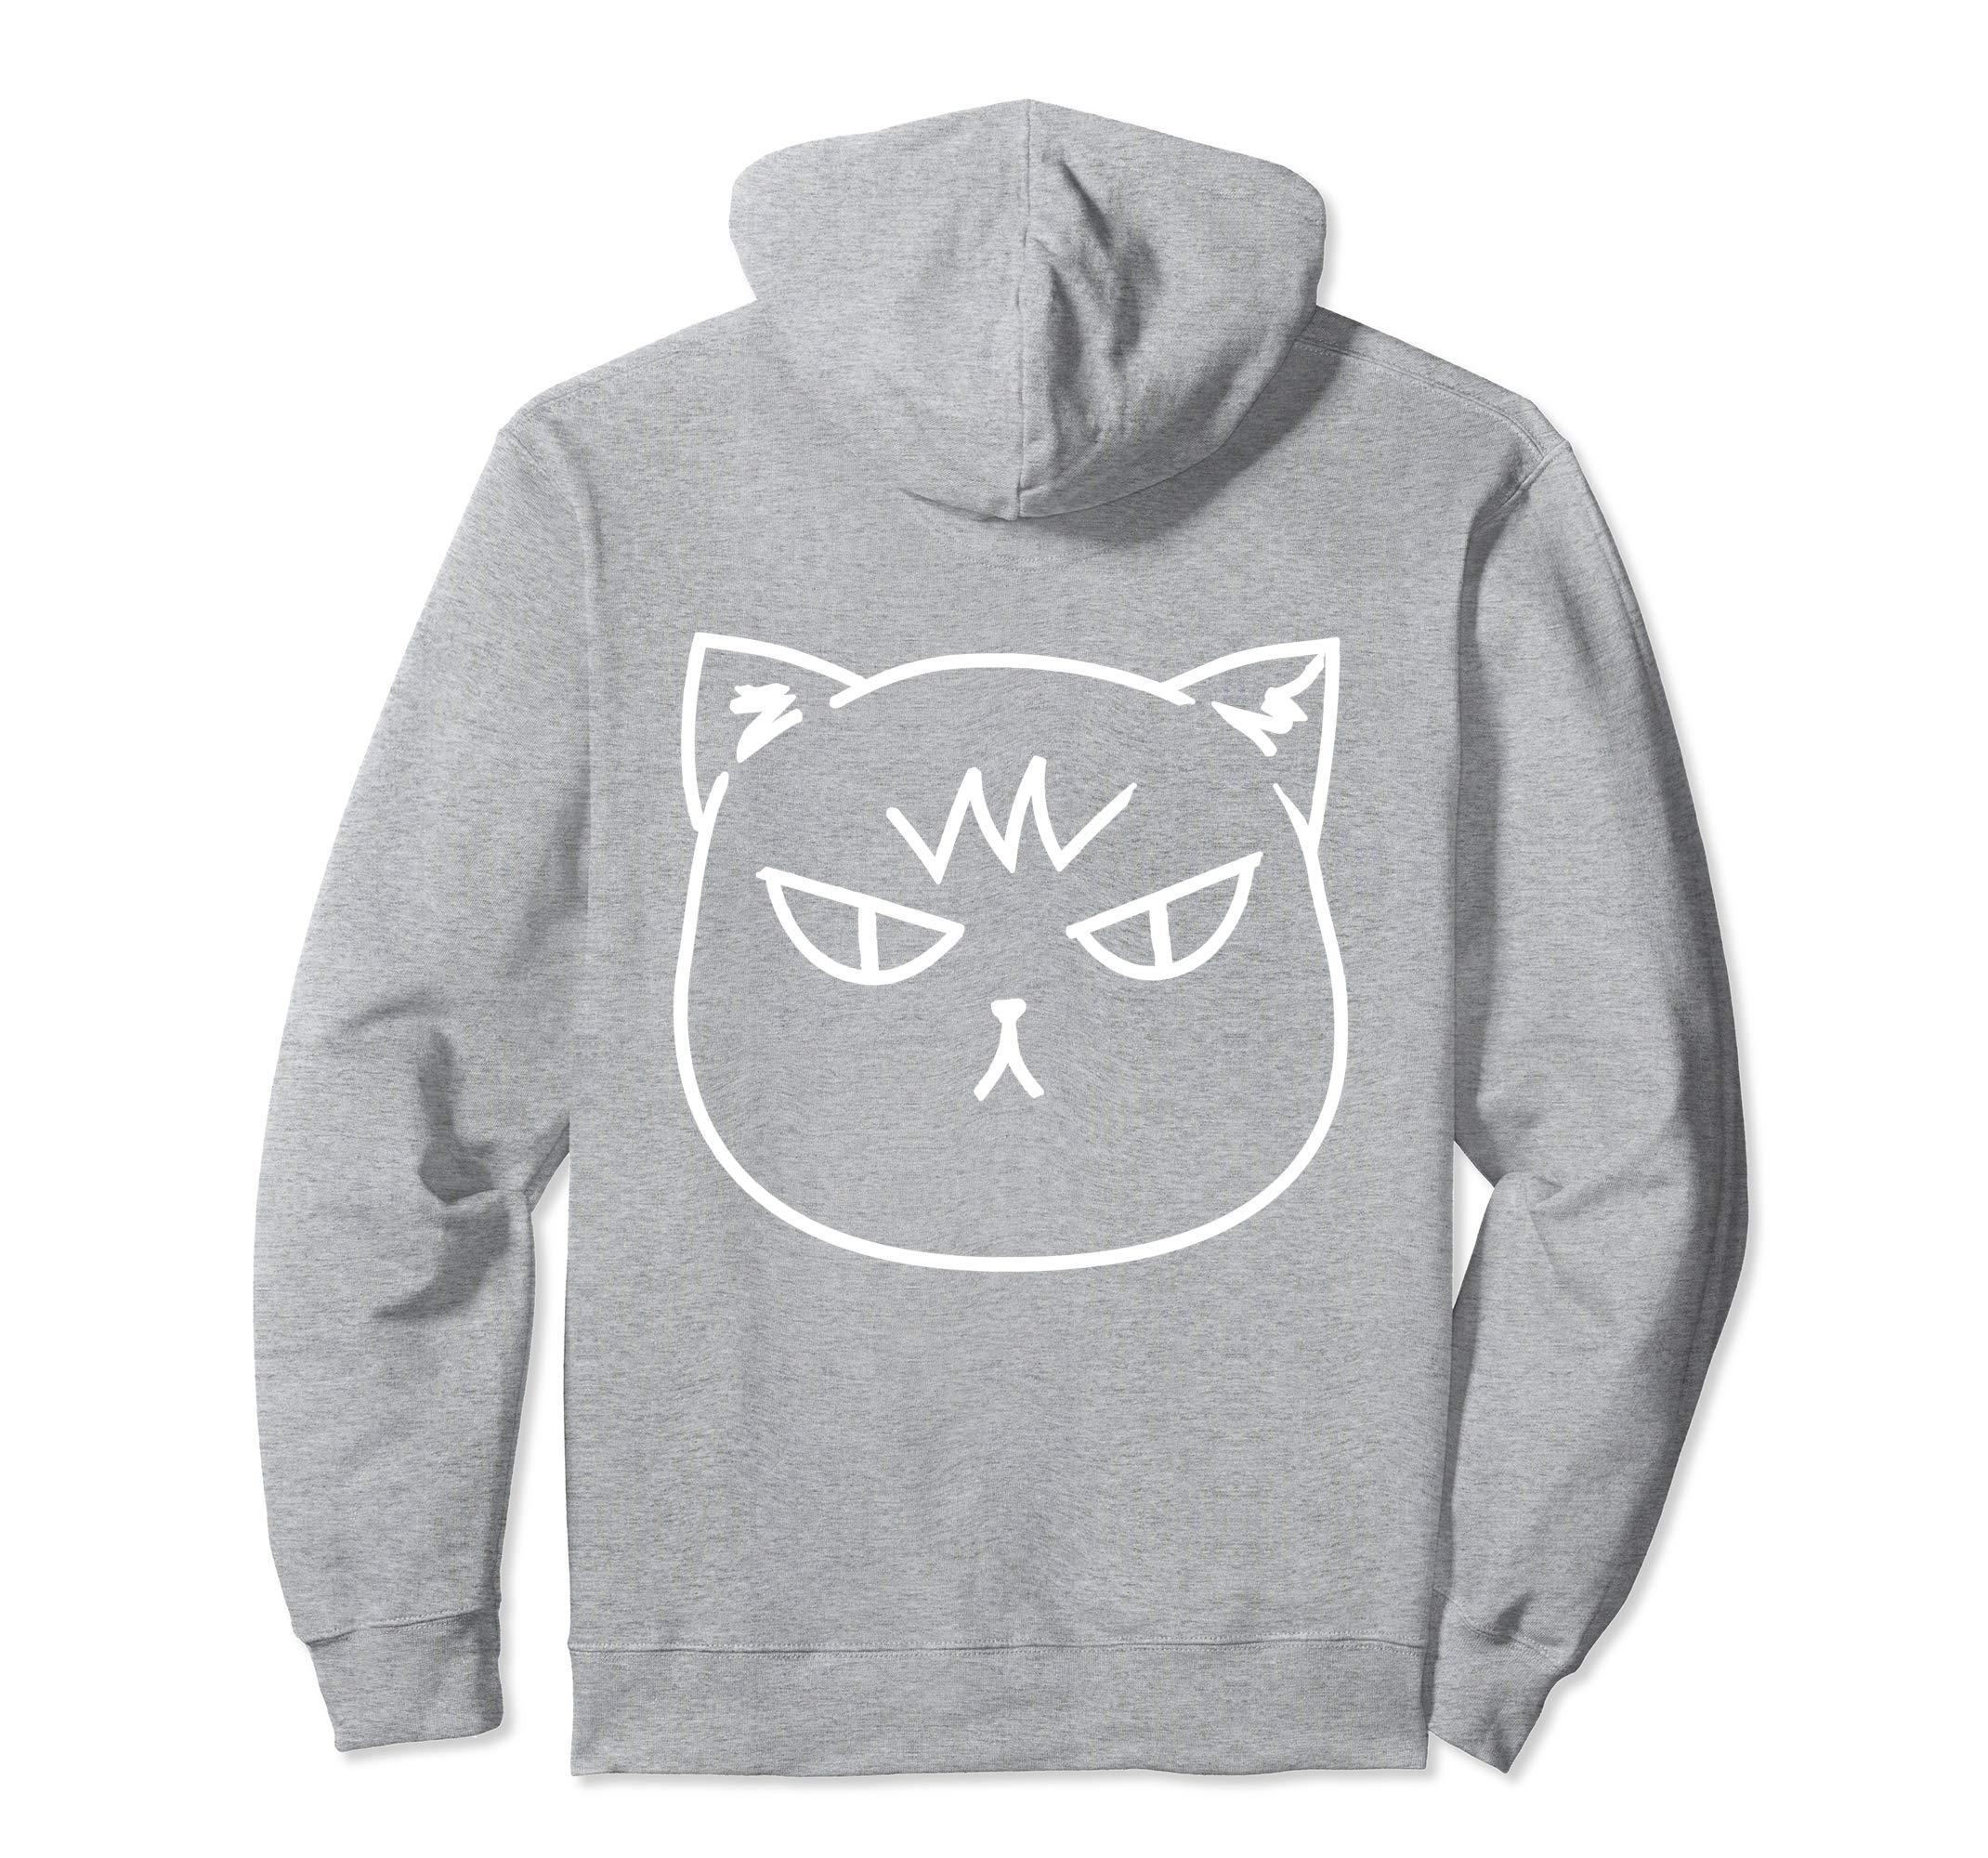 doobz hoodie grey.png